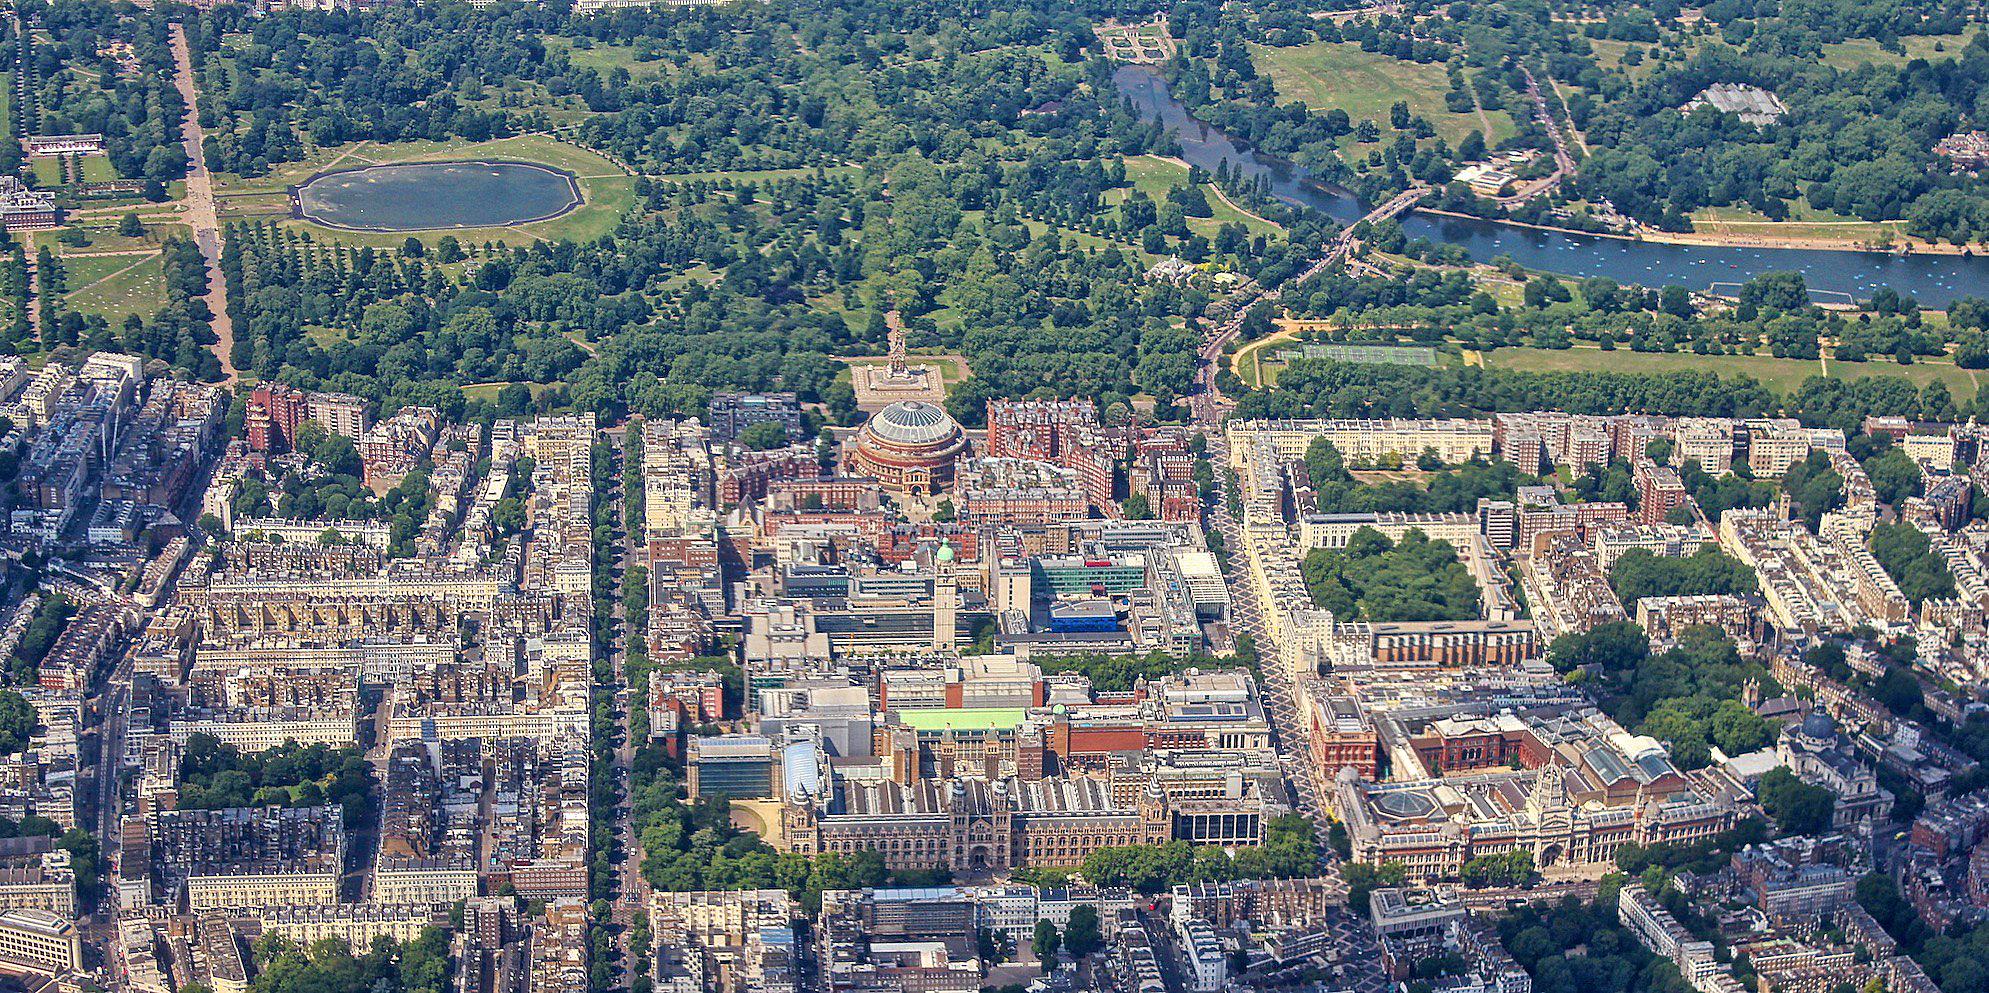 Kensington, London by Ray in Manila.jpg